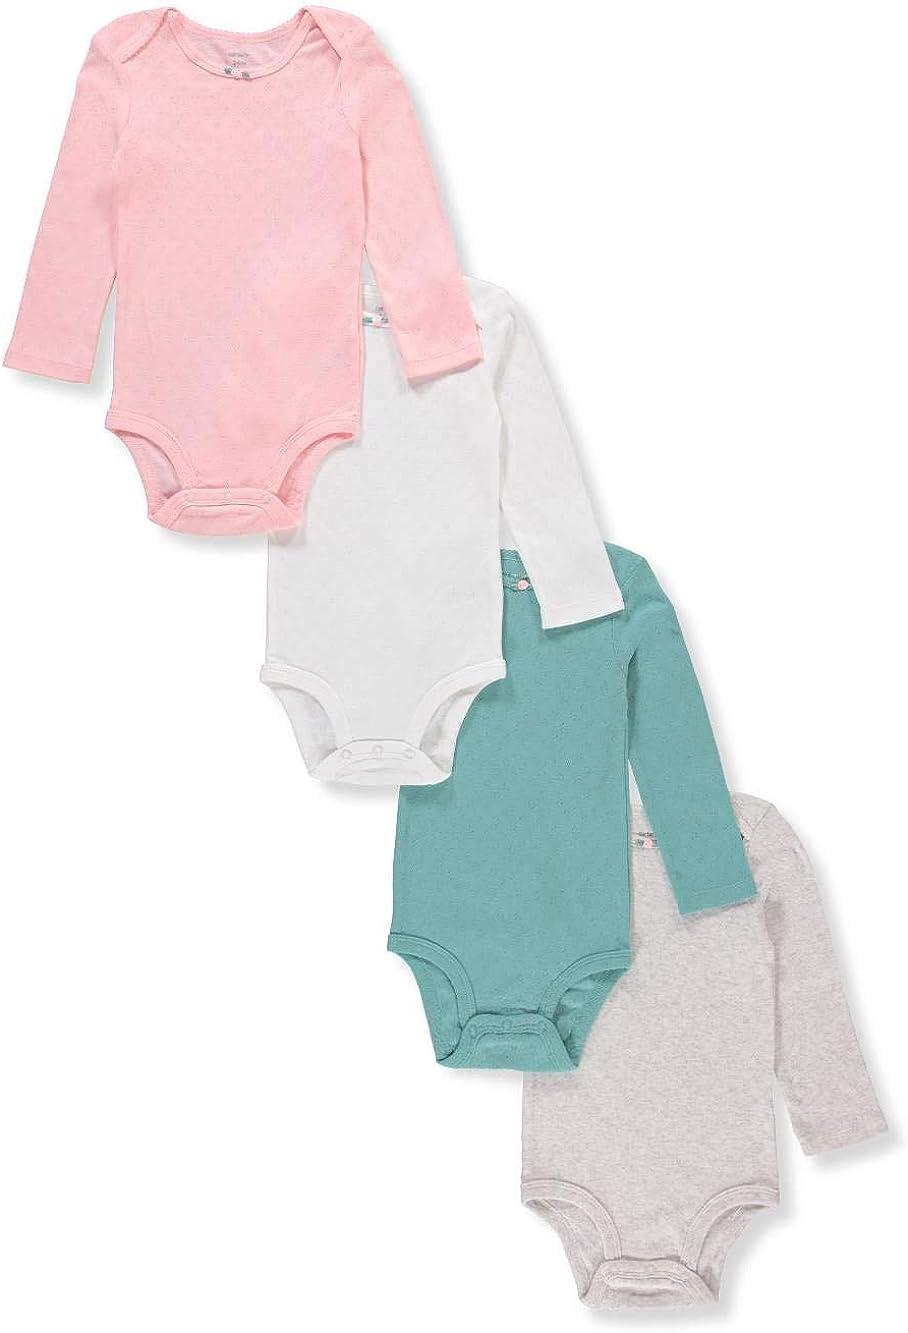 NEW CARTER/'S BABY GIRL 4 PACK LONG SLEEVE BODYSUITS MULTIPLE PATTERNS $26